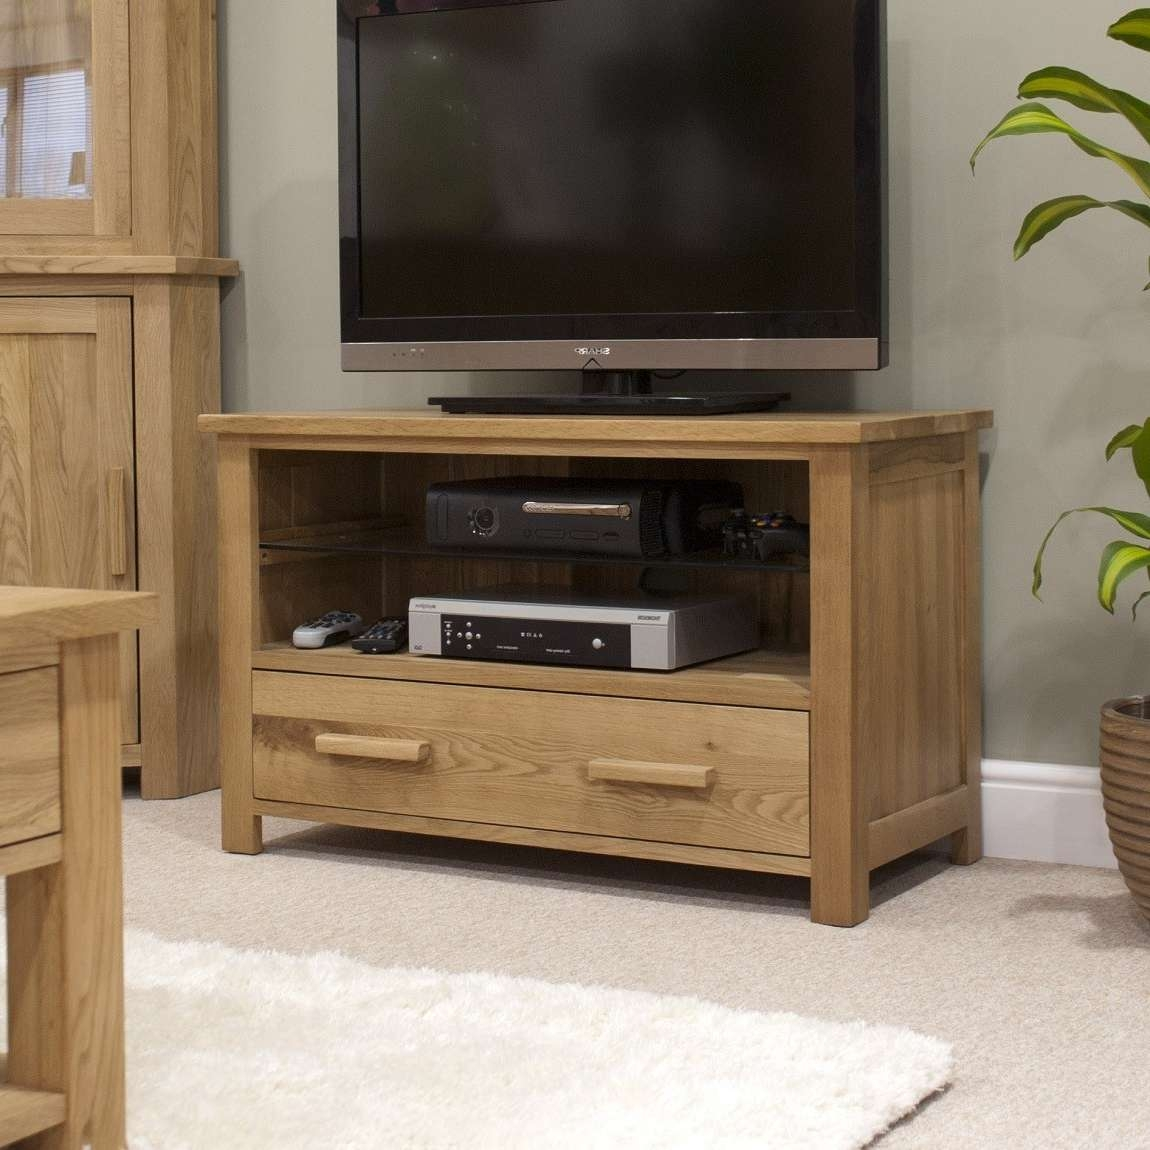 Opus Solid Oak Tv Cabinet | Oak Furniture Uk With Oak Tv Cabinets (View 6 of 20)